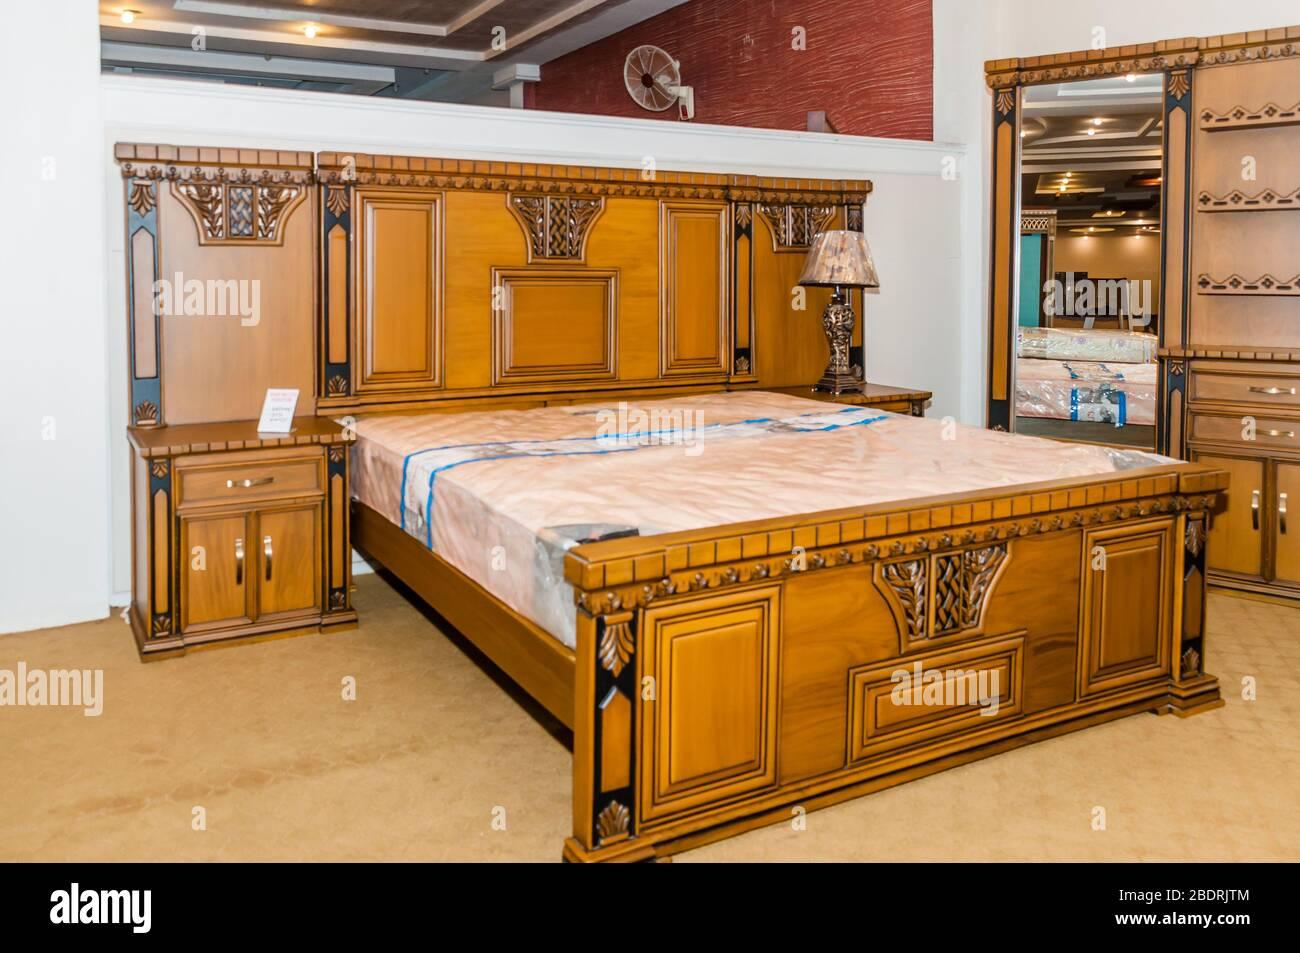 Jhelum Punjab Pakistan January 17 2020 Modern Bedroom With King Side Double Bed With Headboard Side Tables Lamps Jhelum Punjab Pakistan Stock Photo Alamy